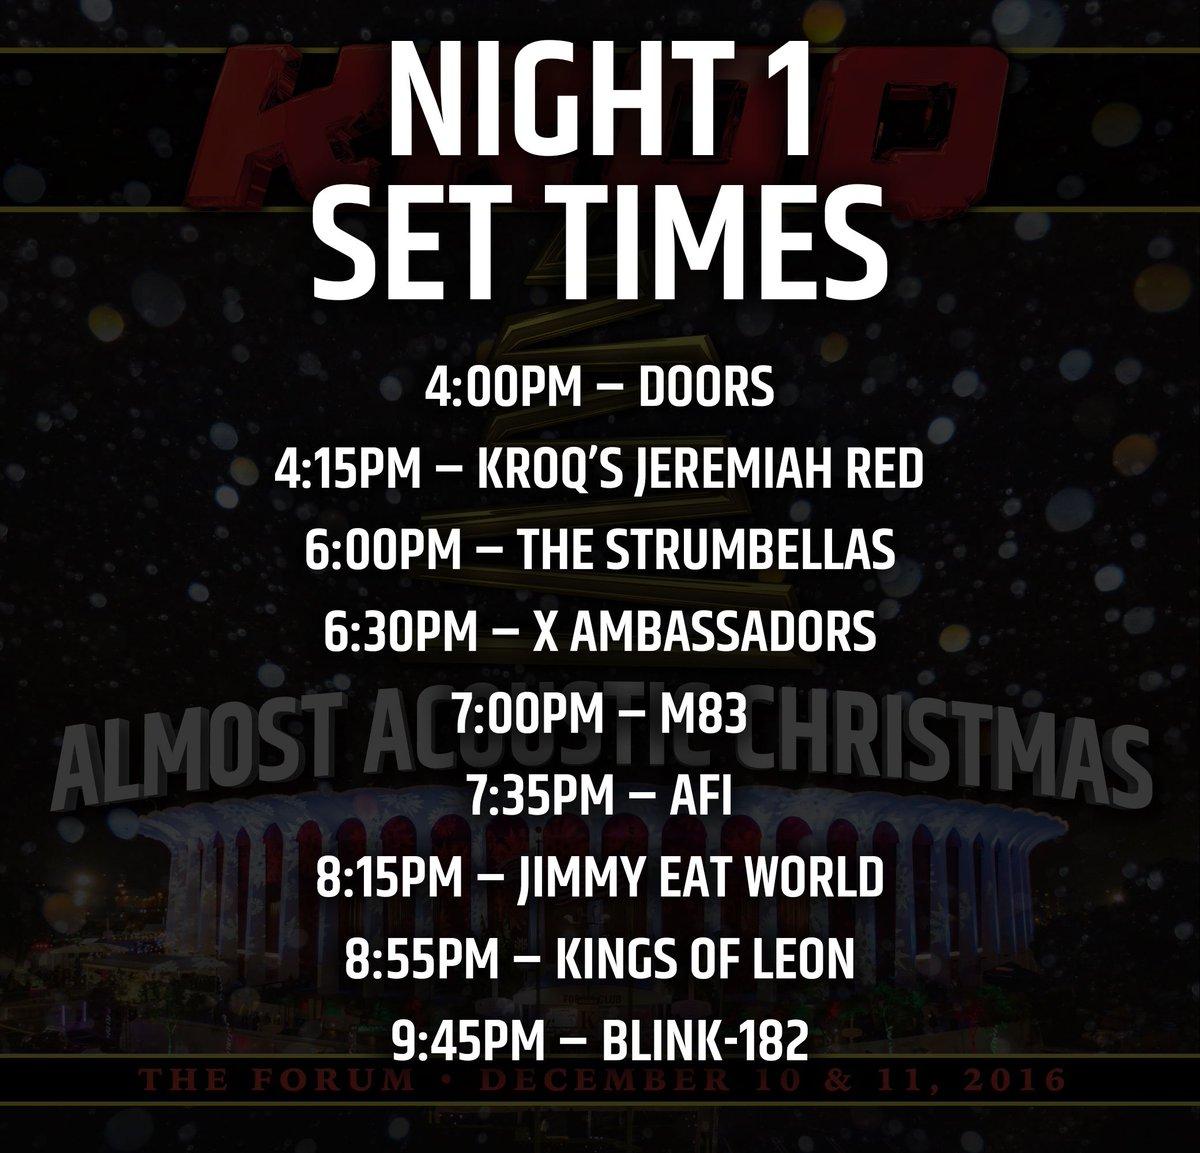 kroq on twitter kroq almost acoustic christmas set times venue info more httpstco5bwqc6rf3z kroqxmas - Kroq Christmas